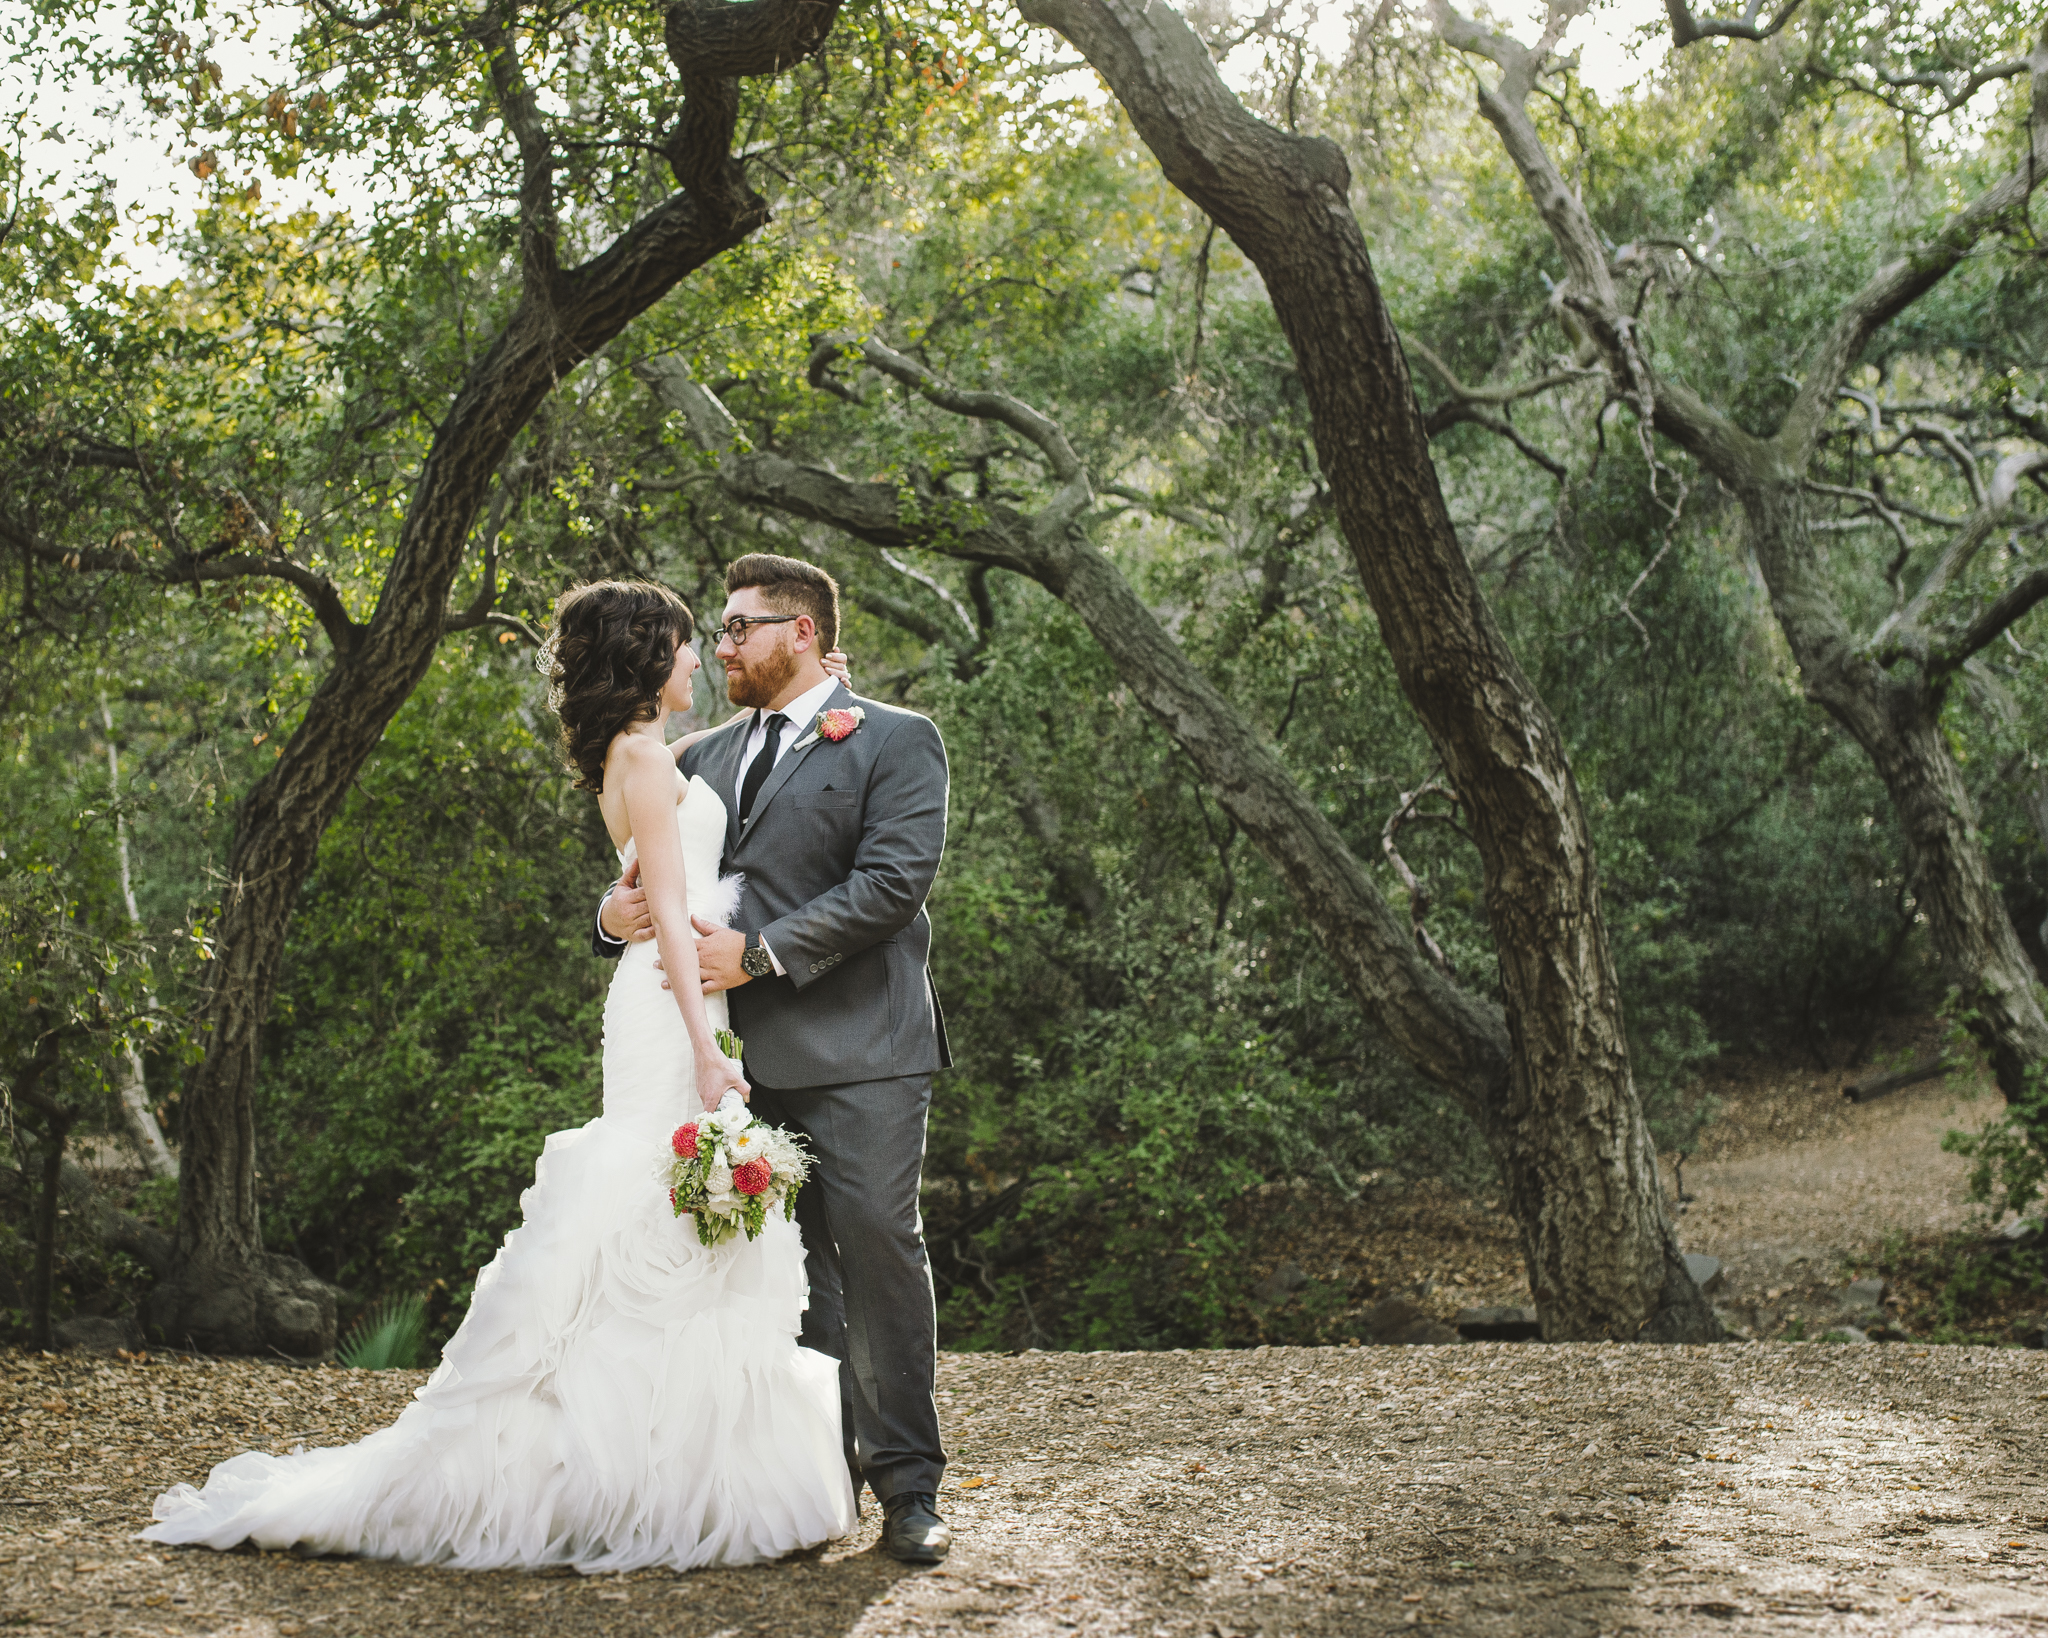 Isaiah & Taylor Photography - Los Angeles Lifestyle Wedding Photographer-17.jpg